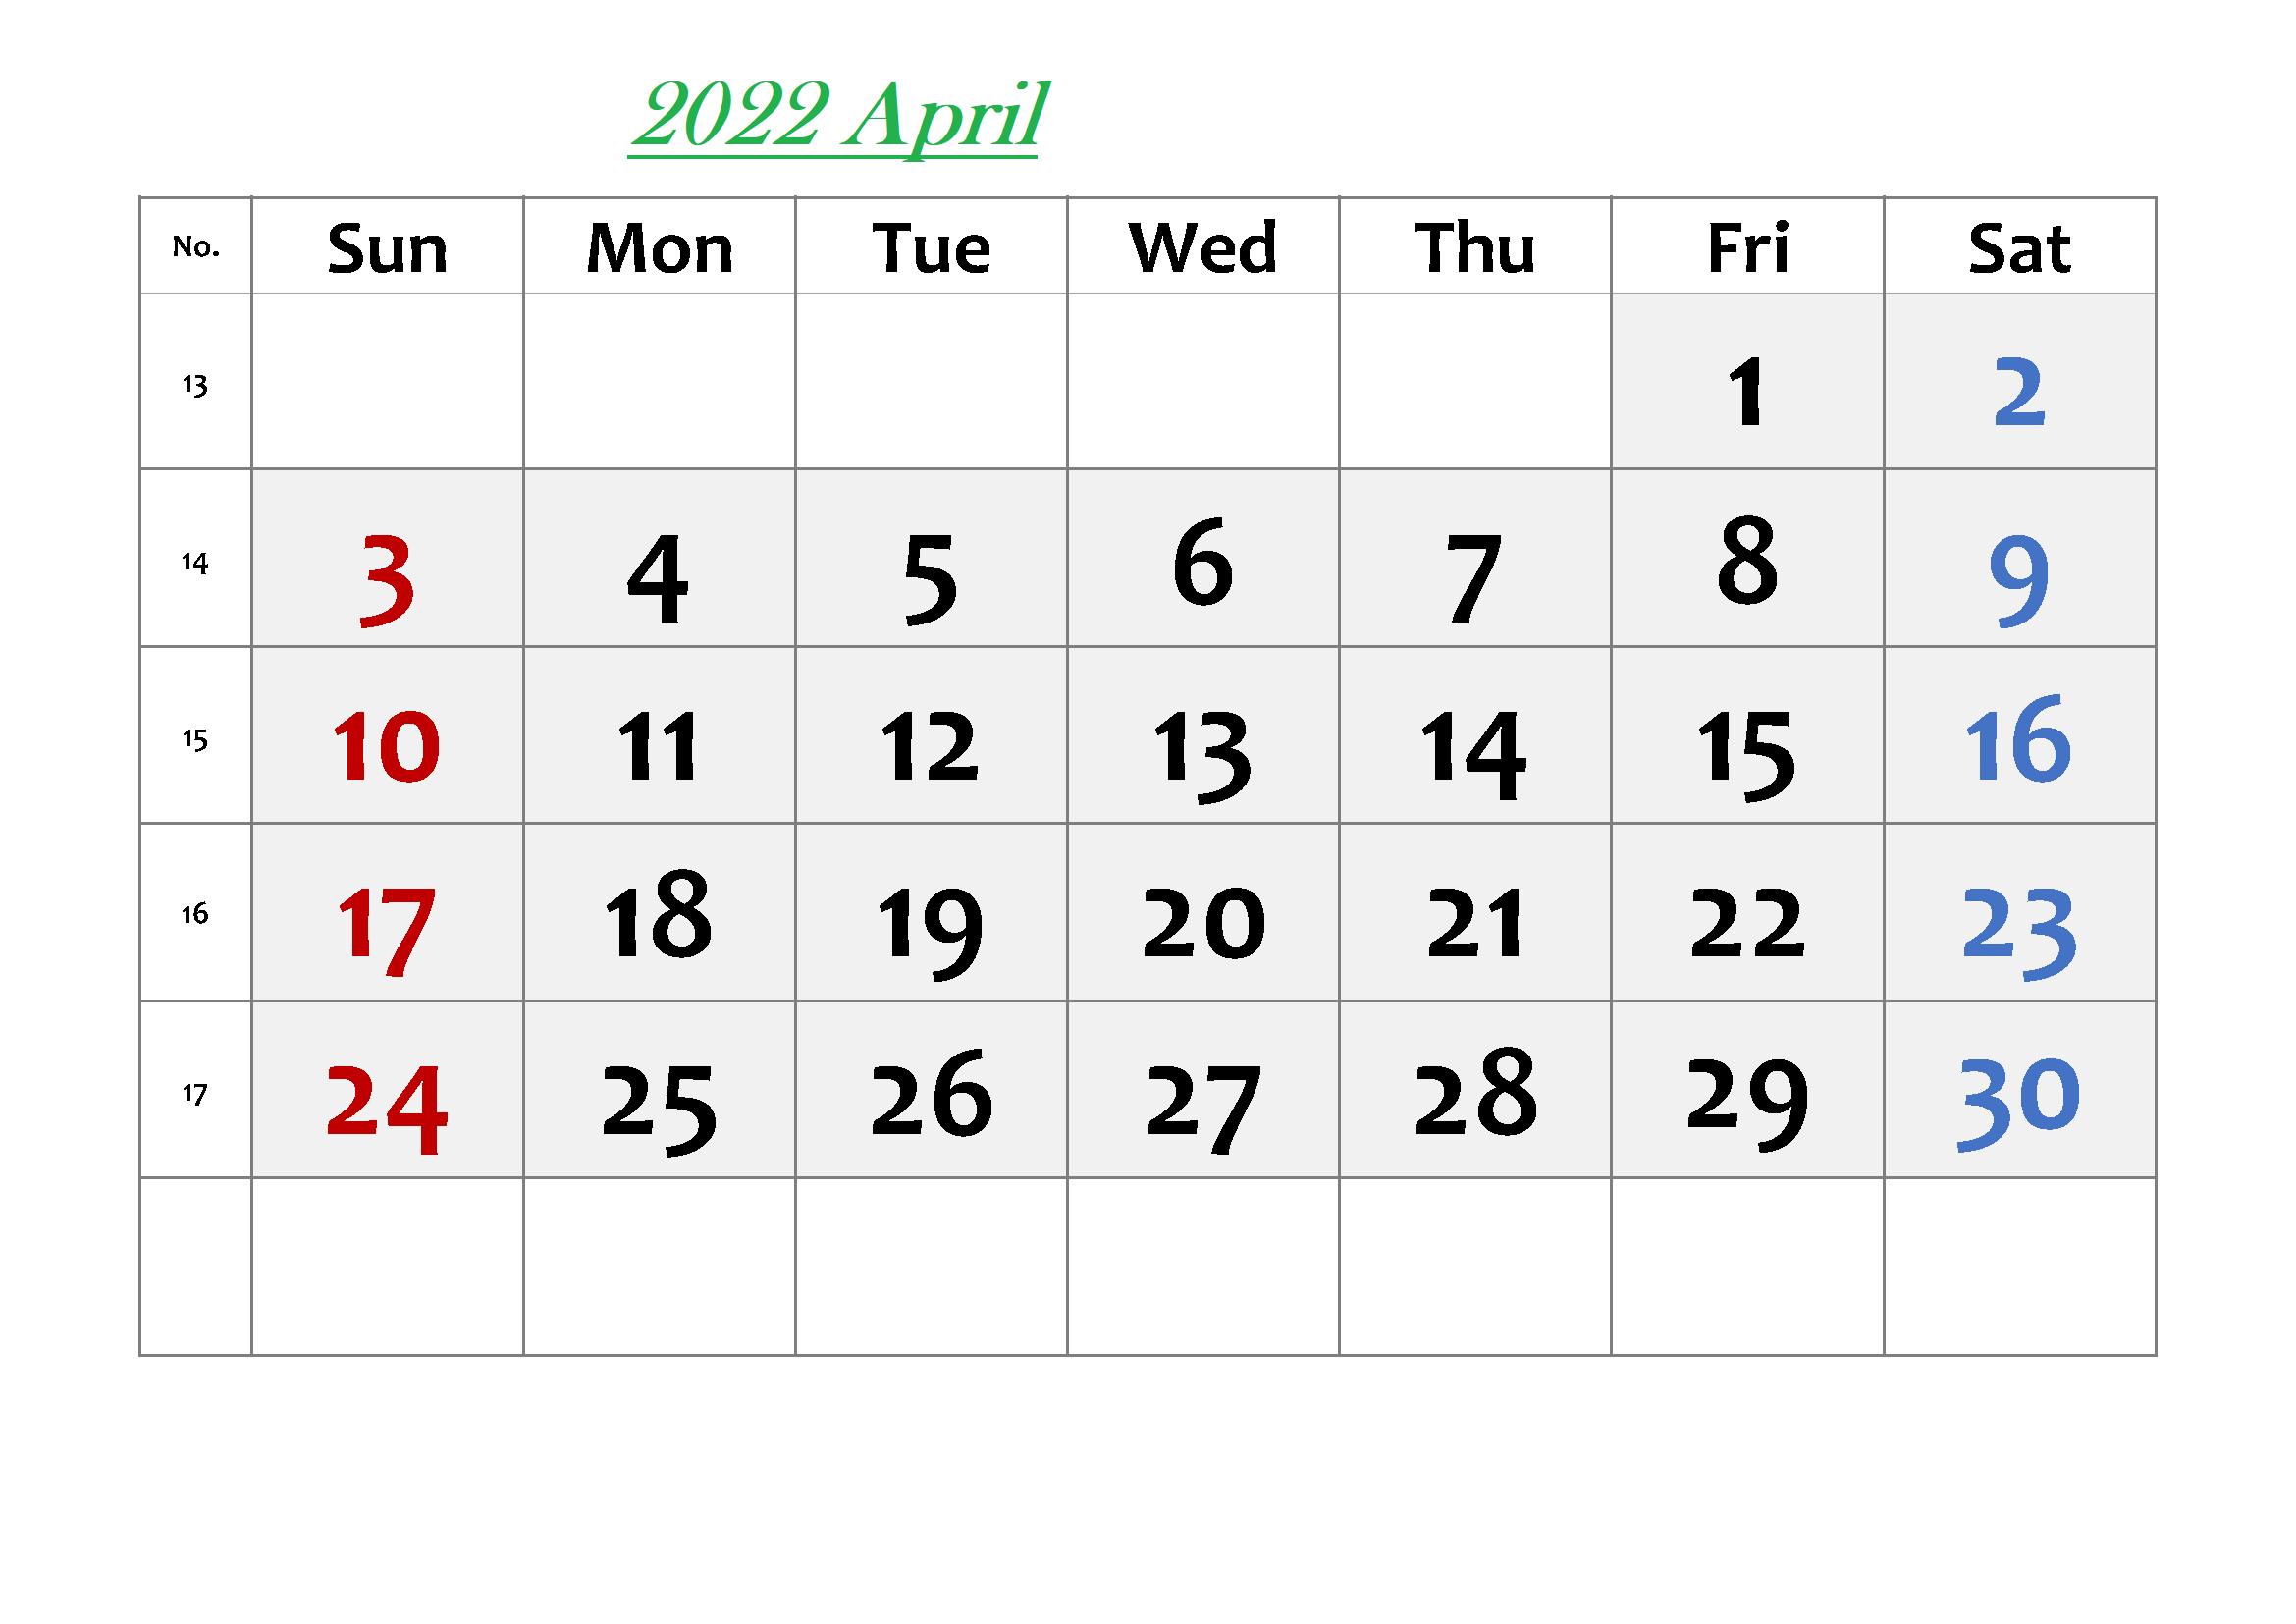 Free-Download-April-2022-Calendar